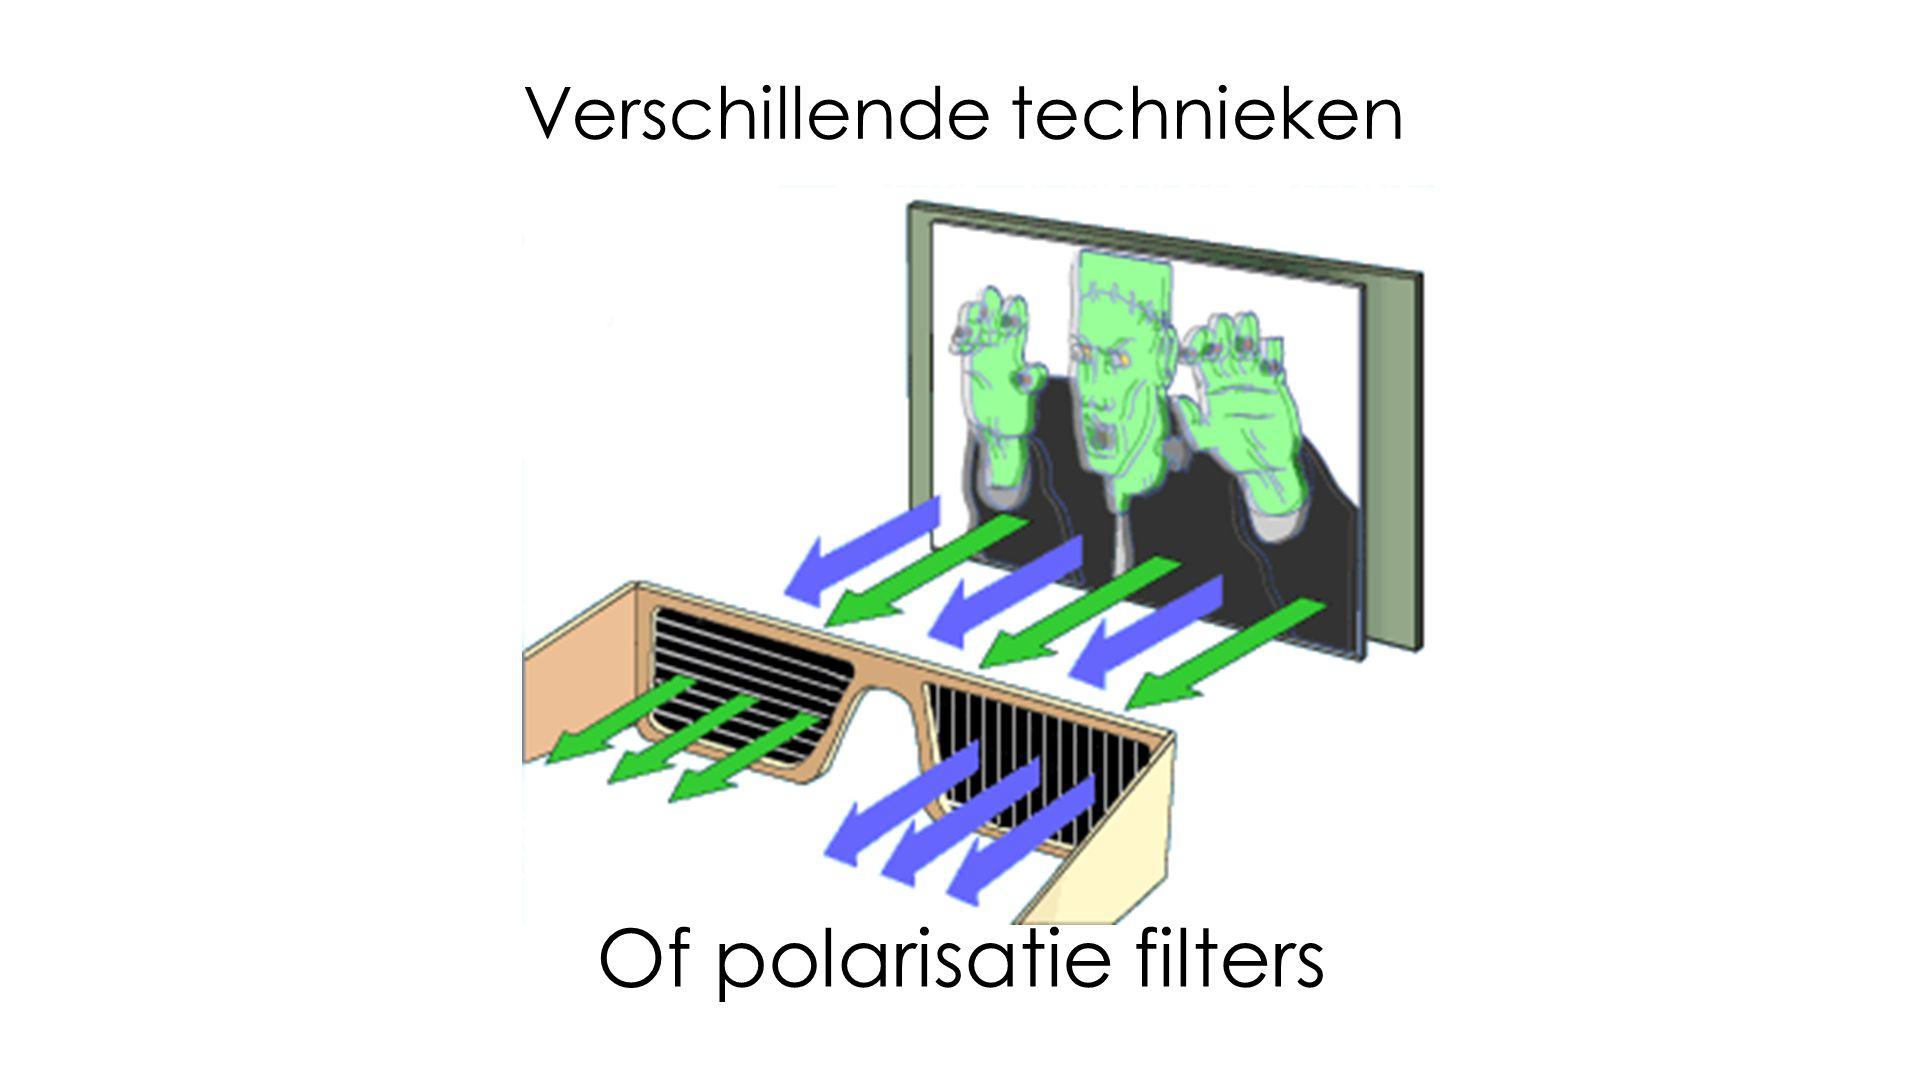 Of polarisatie filters